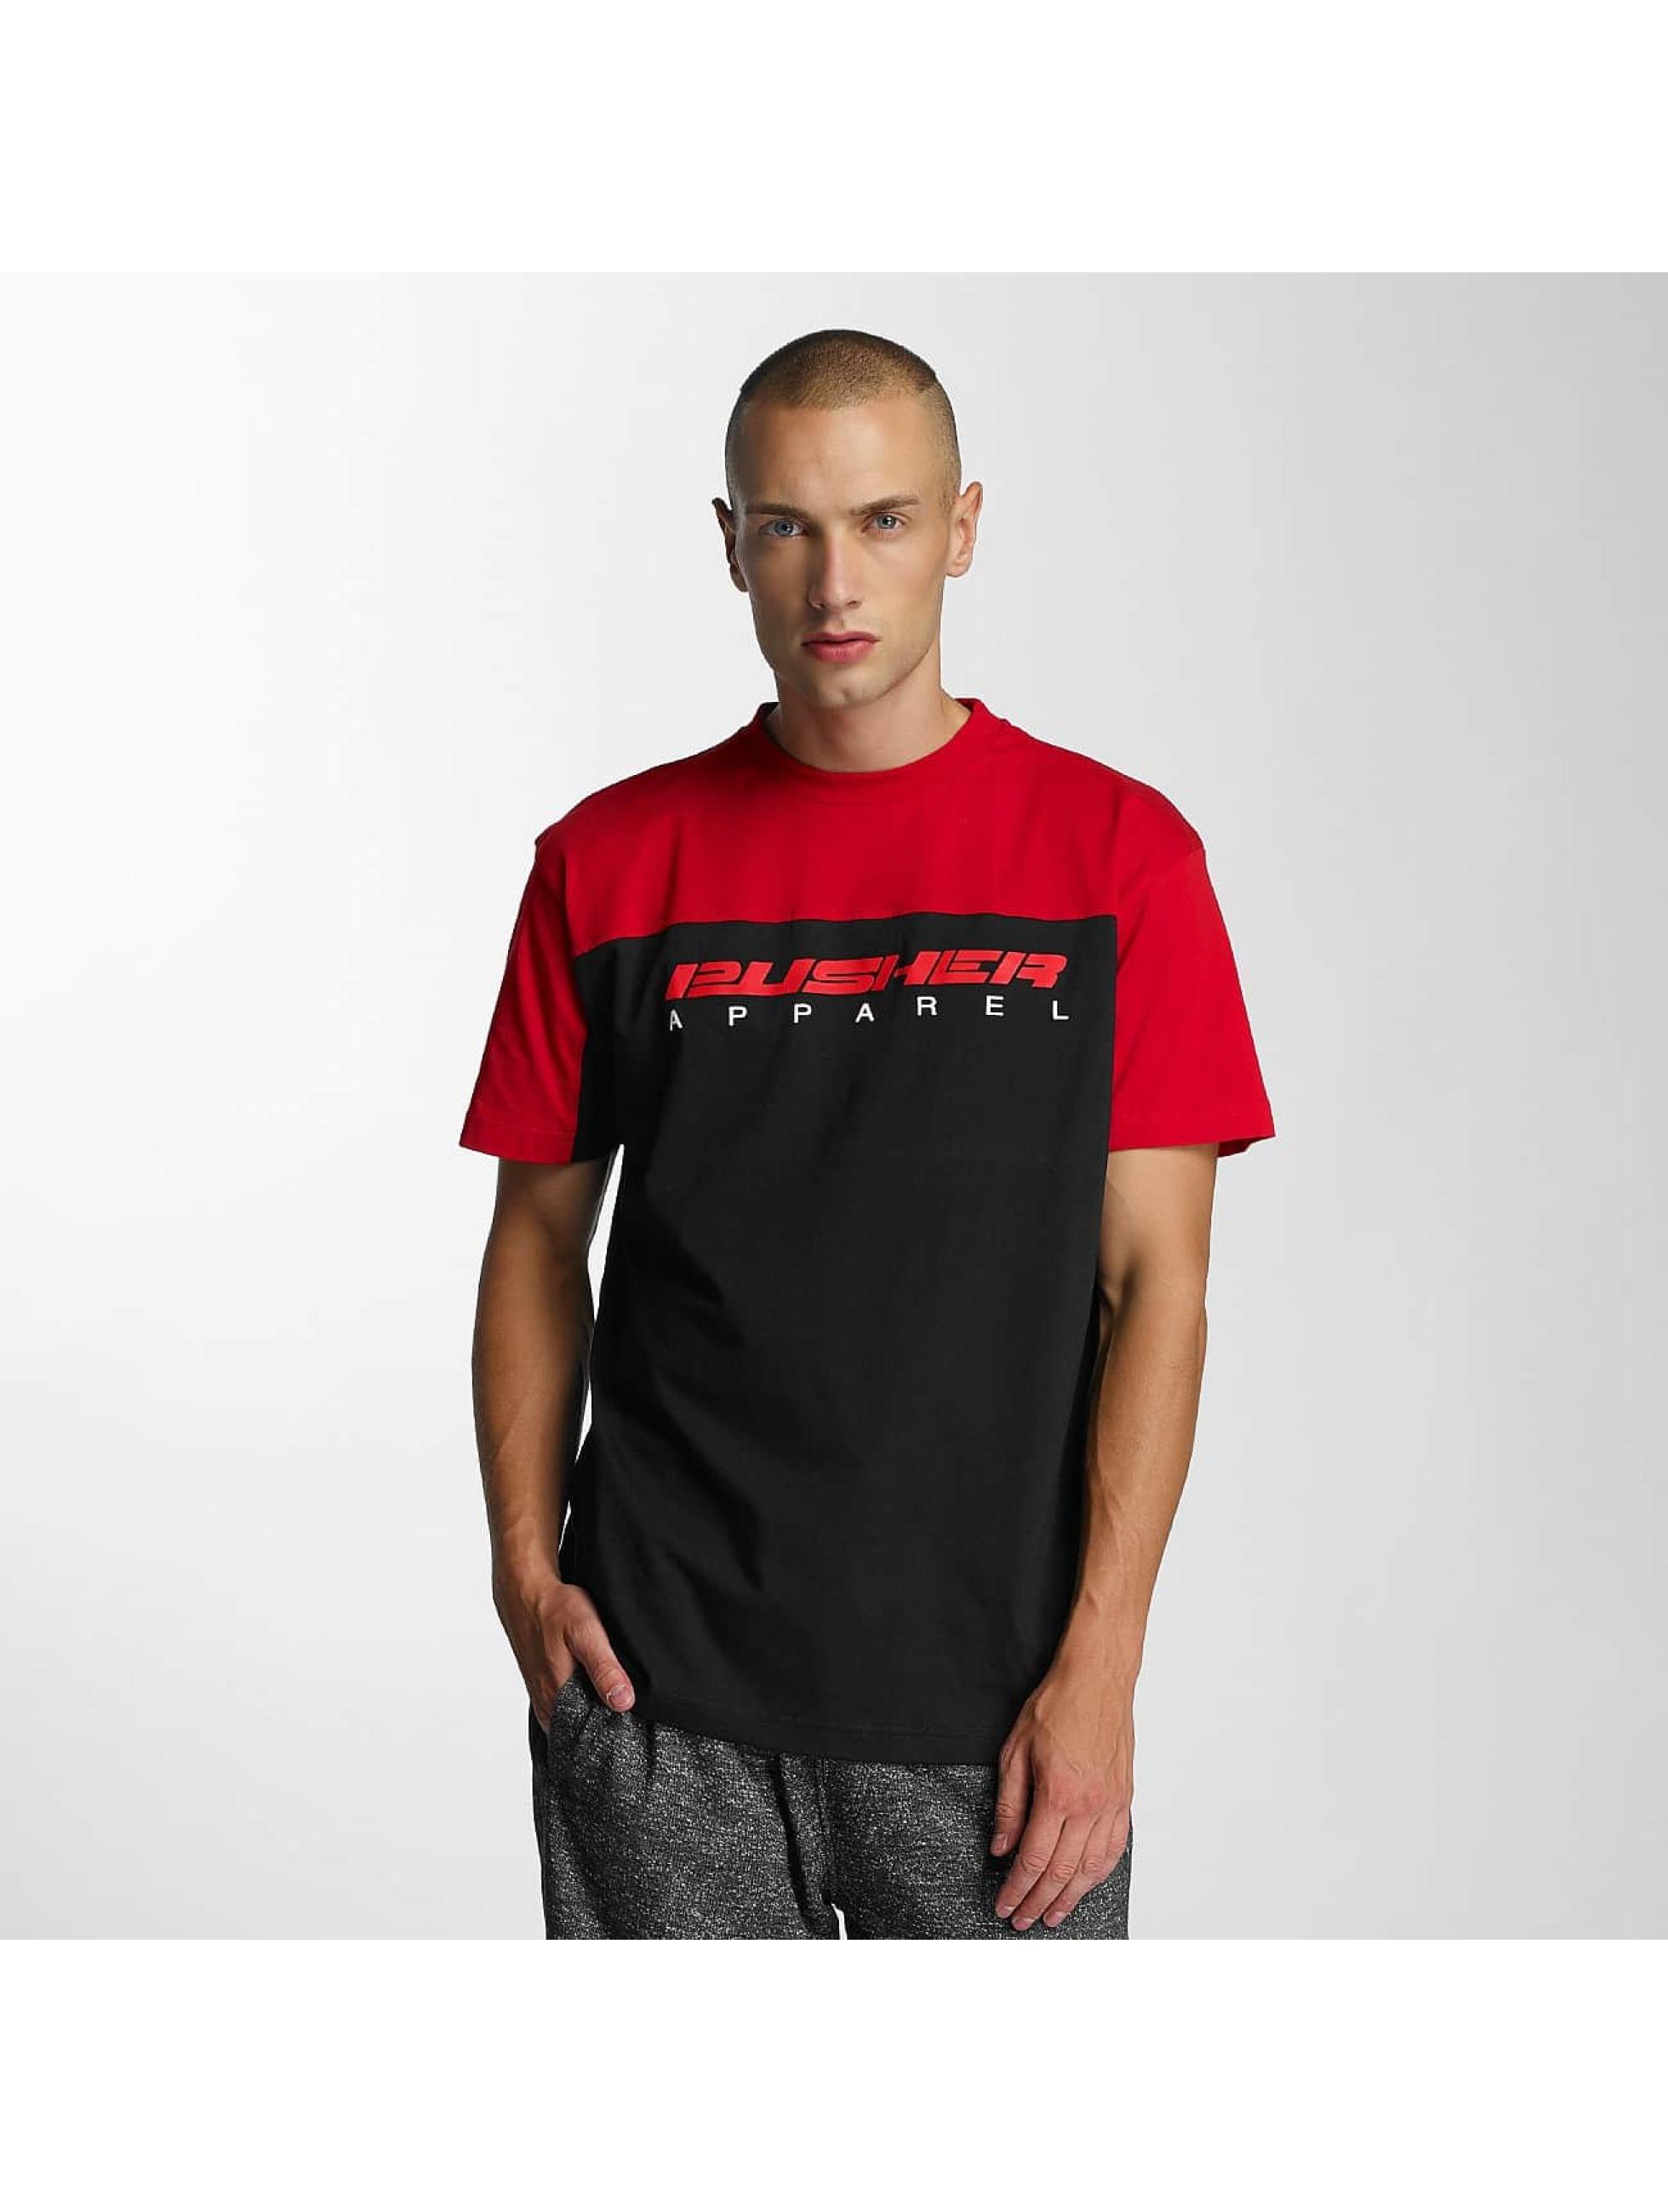 Pusher Apparel Camiseta Apparel 137 Riot negro